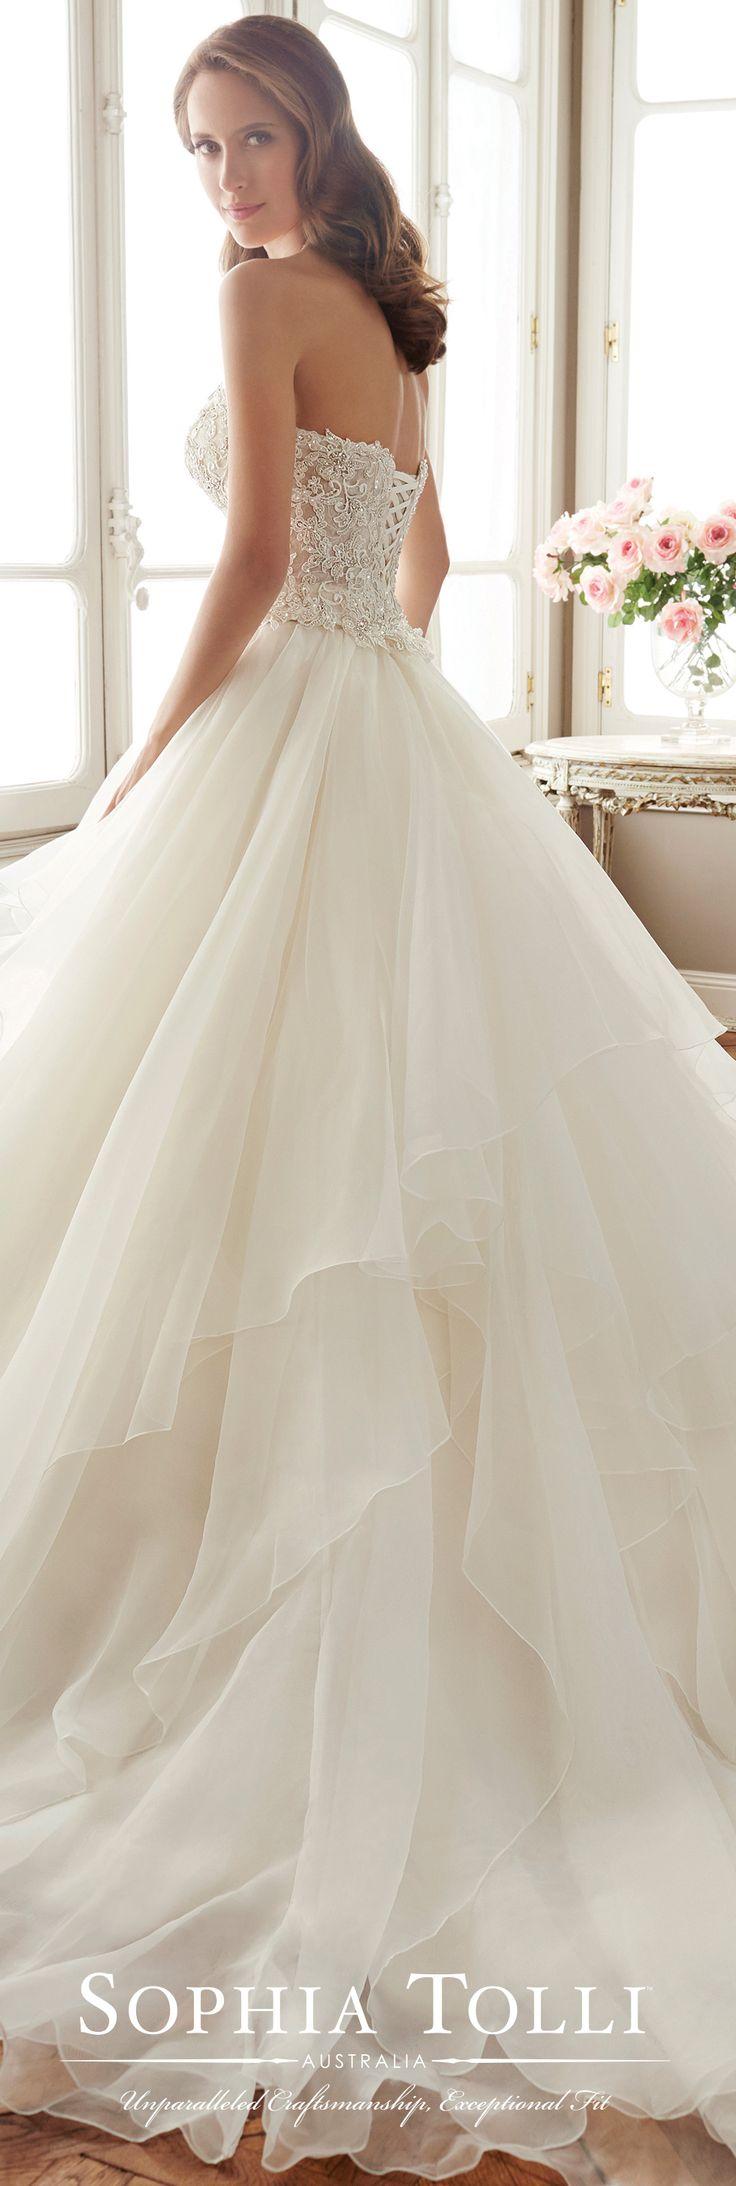 The 276 best Sophia Tolli Wedding Dresses images on Pinterest ...